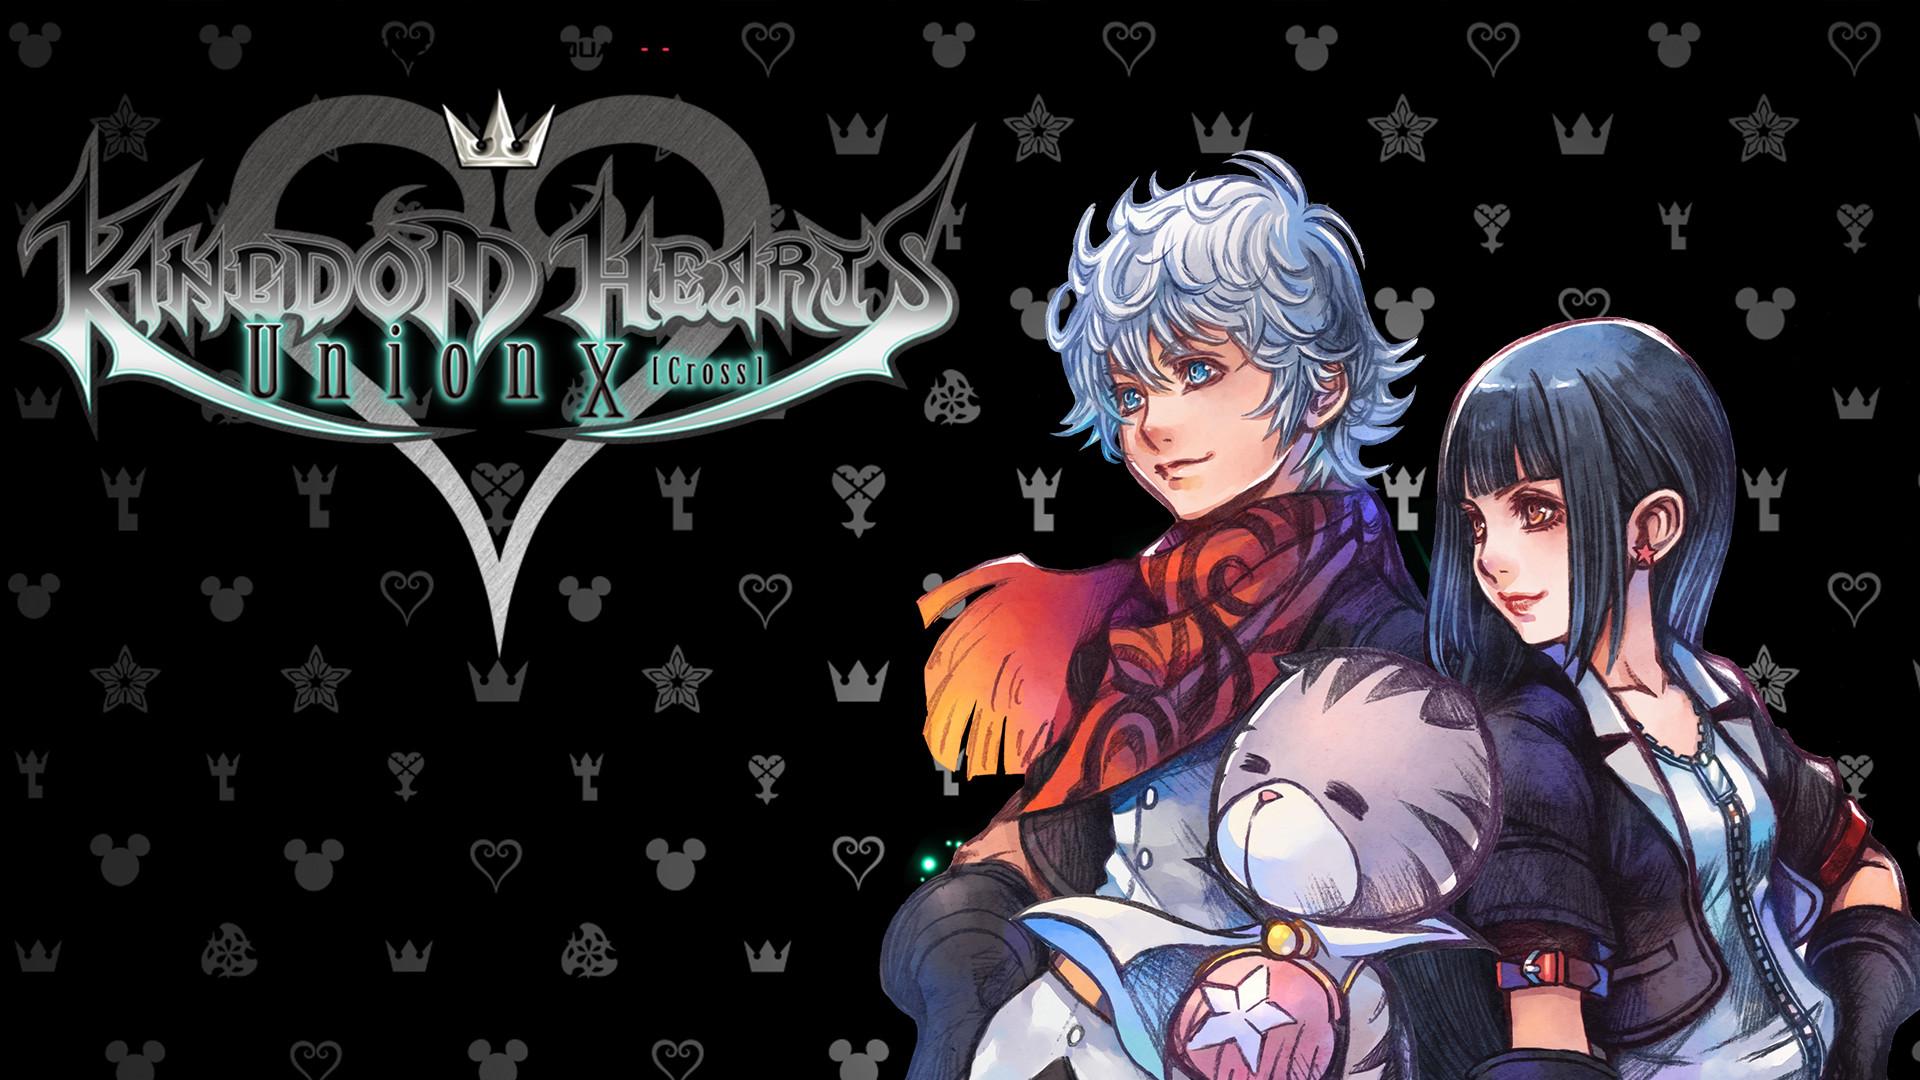 … Kingdom Hearts: Union X [Cross] Wallpaper by The-Dark-Mamba-